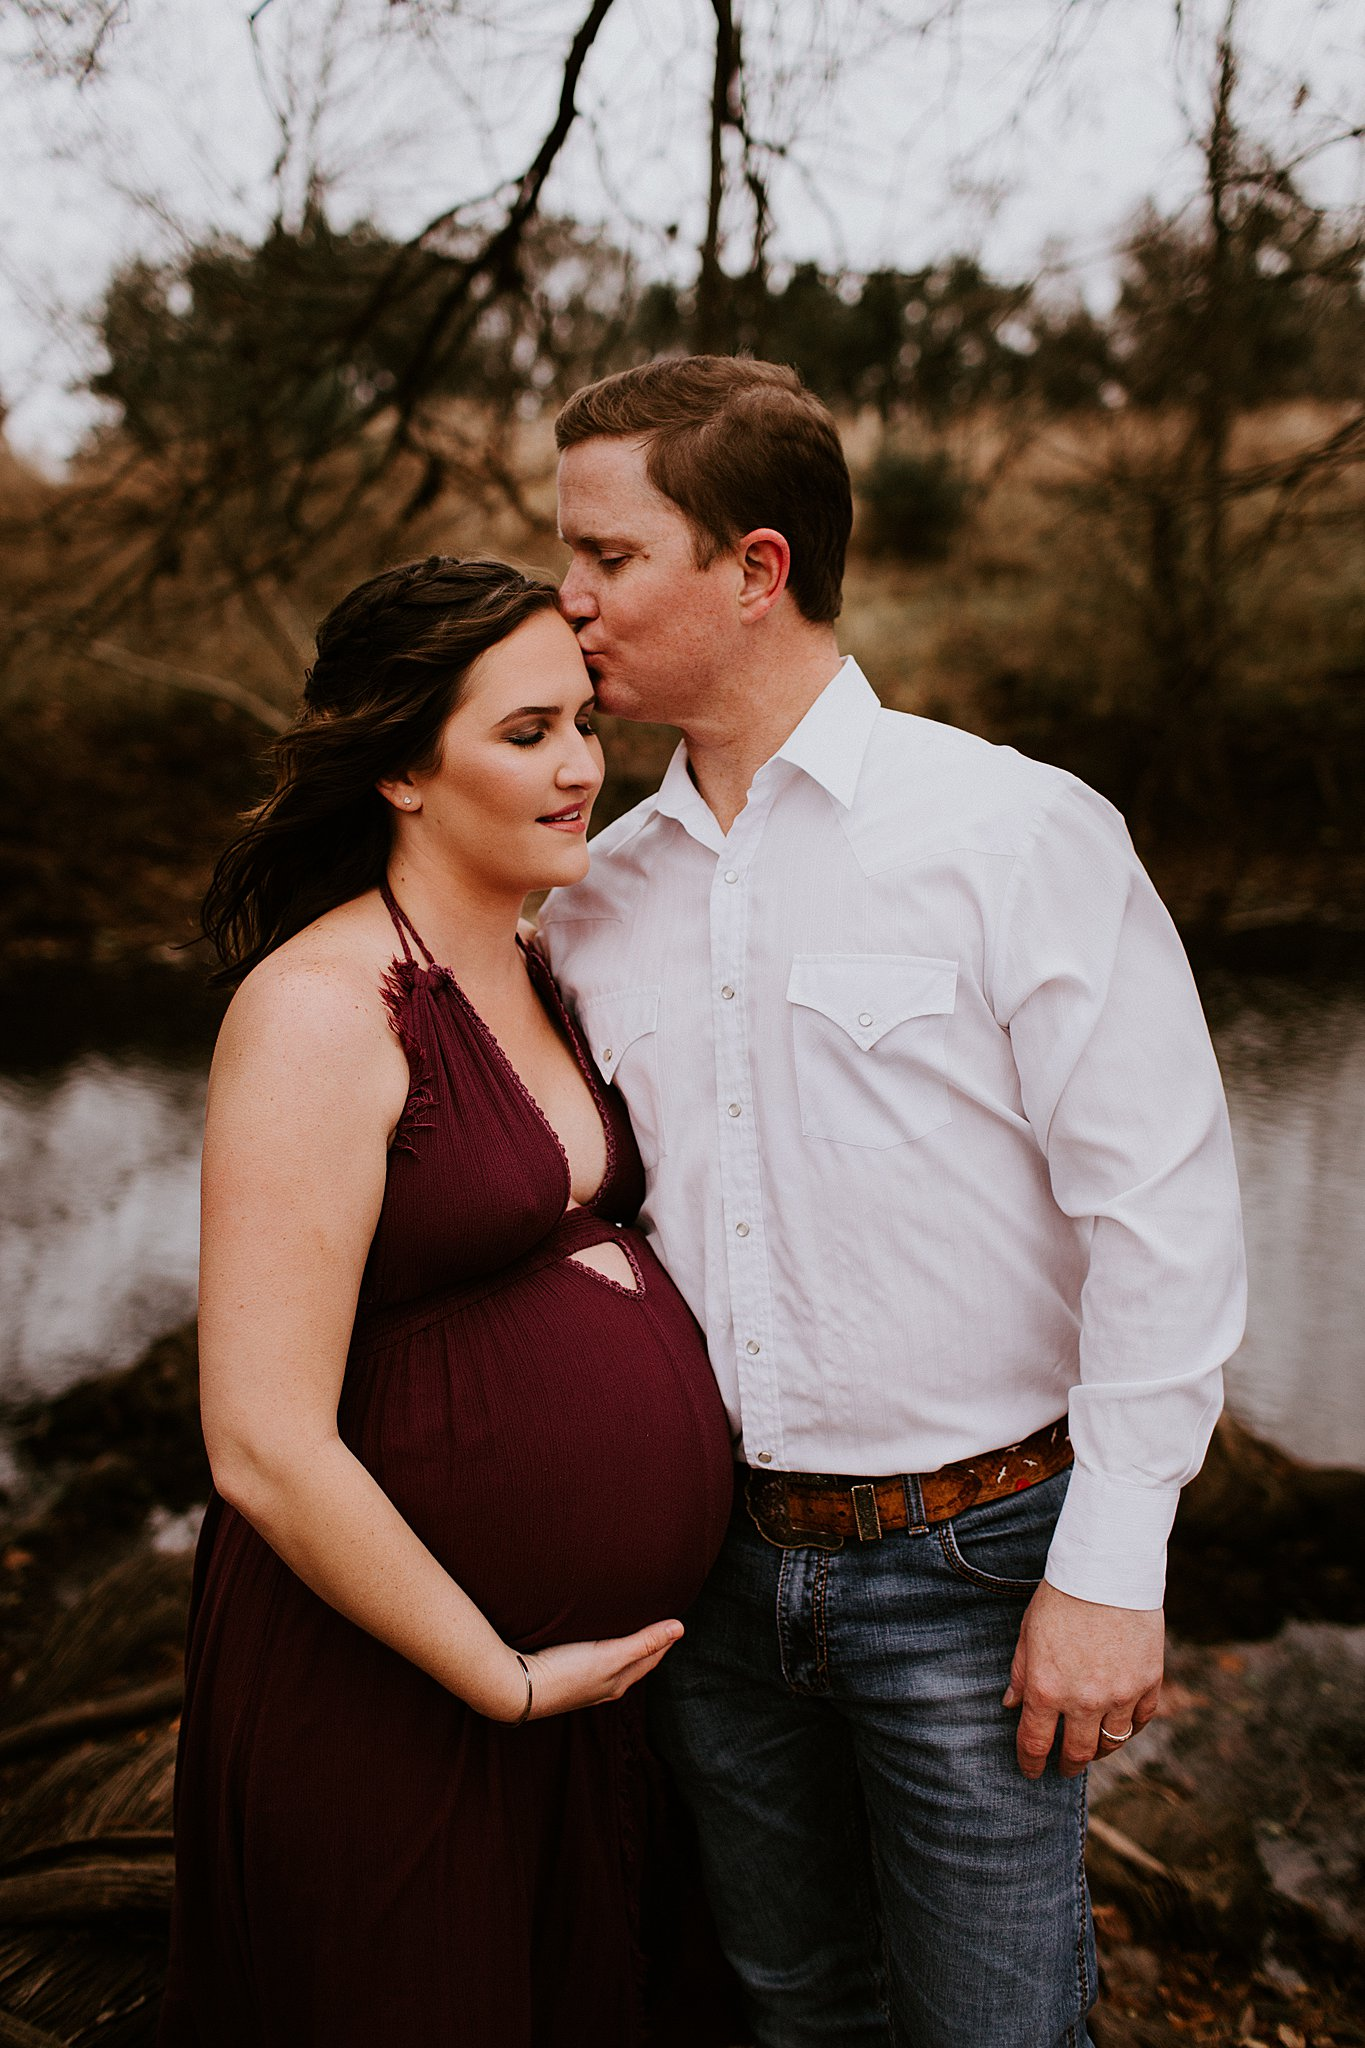 Katie-San-Antonio-Maternity-Photographer-11_WEB.jpg